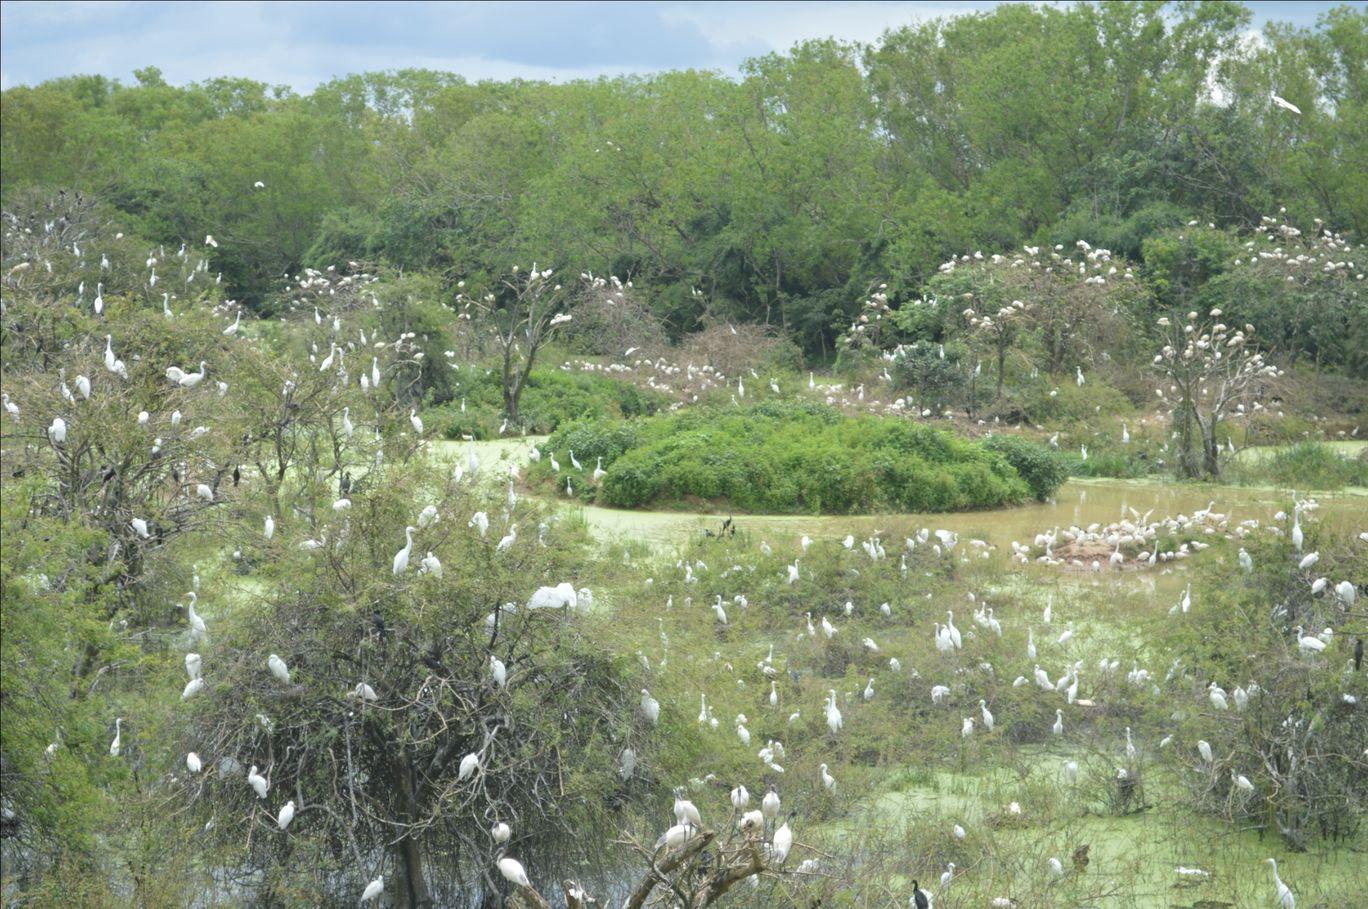 Photo of Gudavi Bird Sanctuary By Anees Anavatti